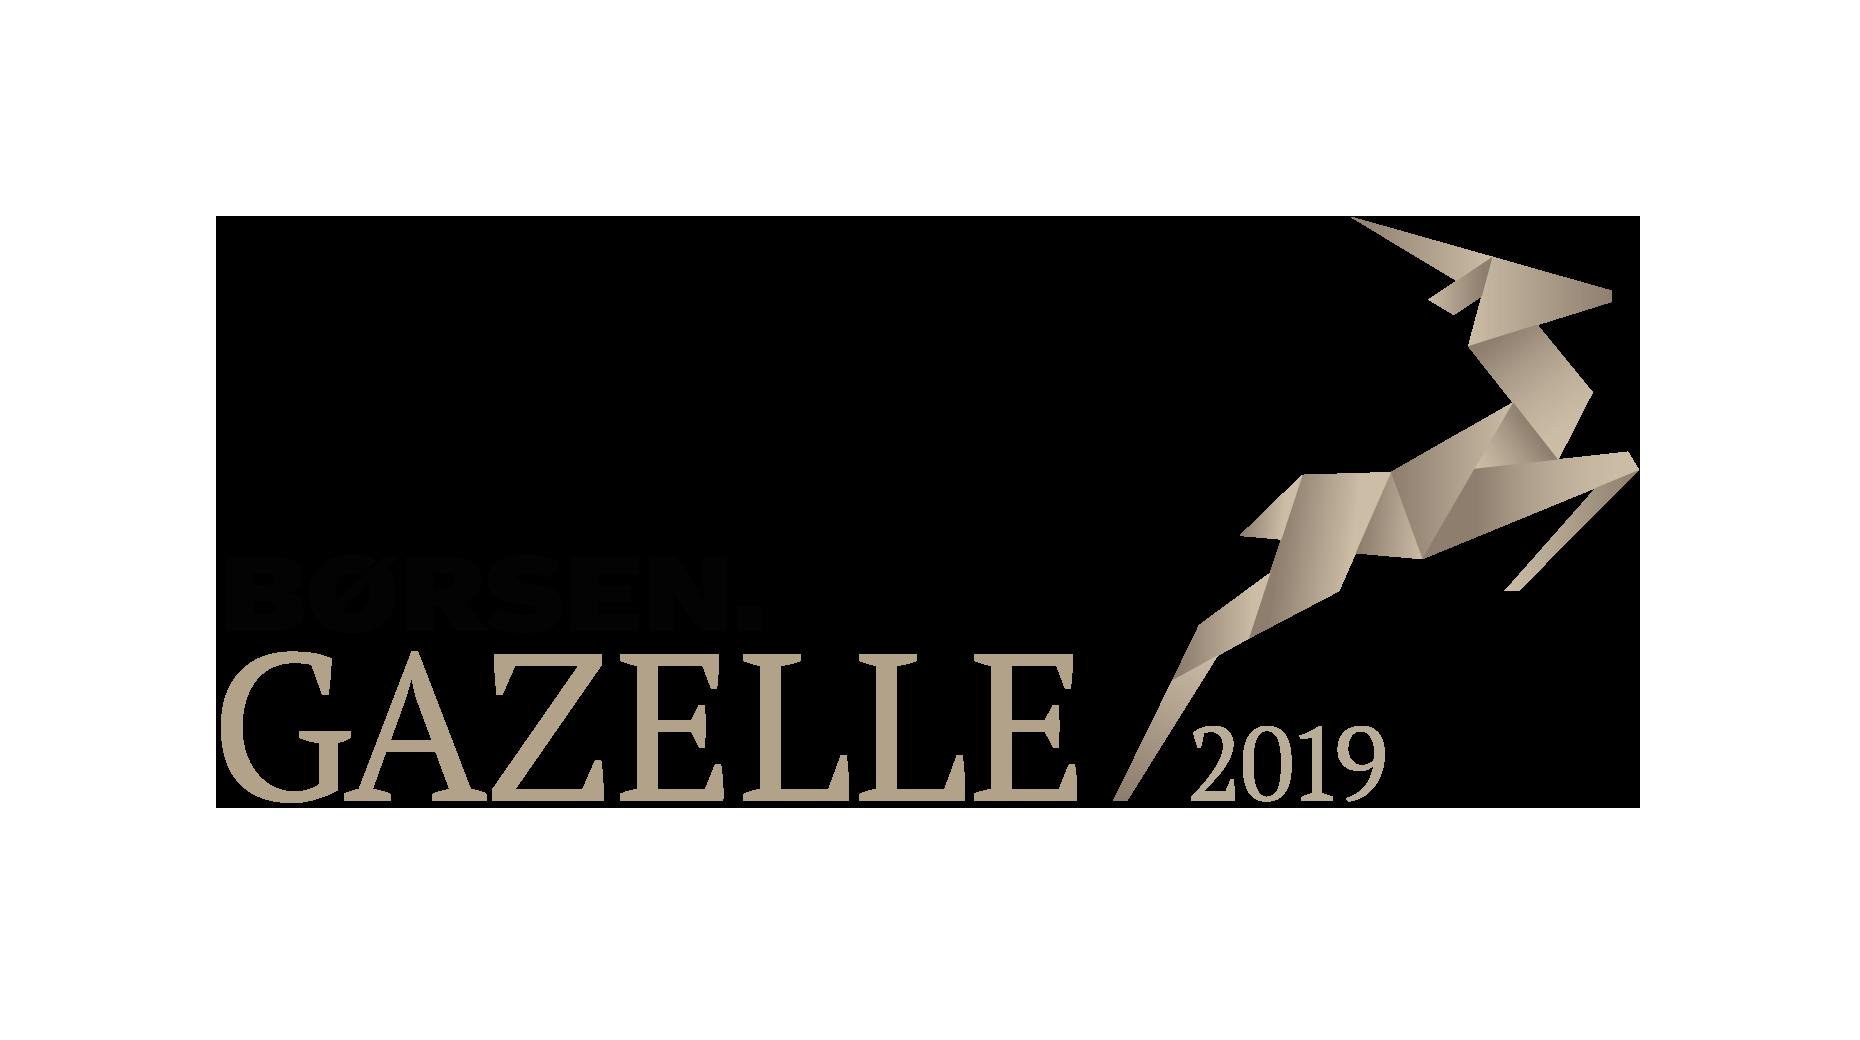 gazelle2019-logo_RGB_positiv-1